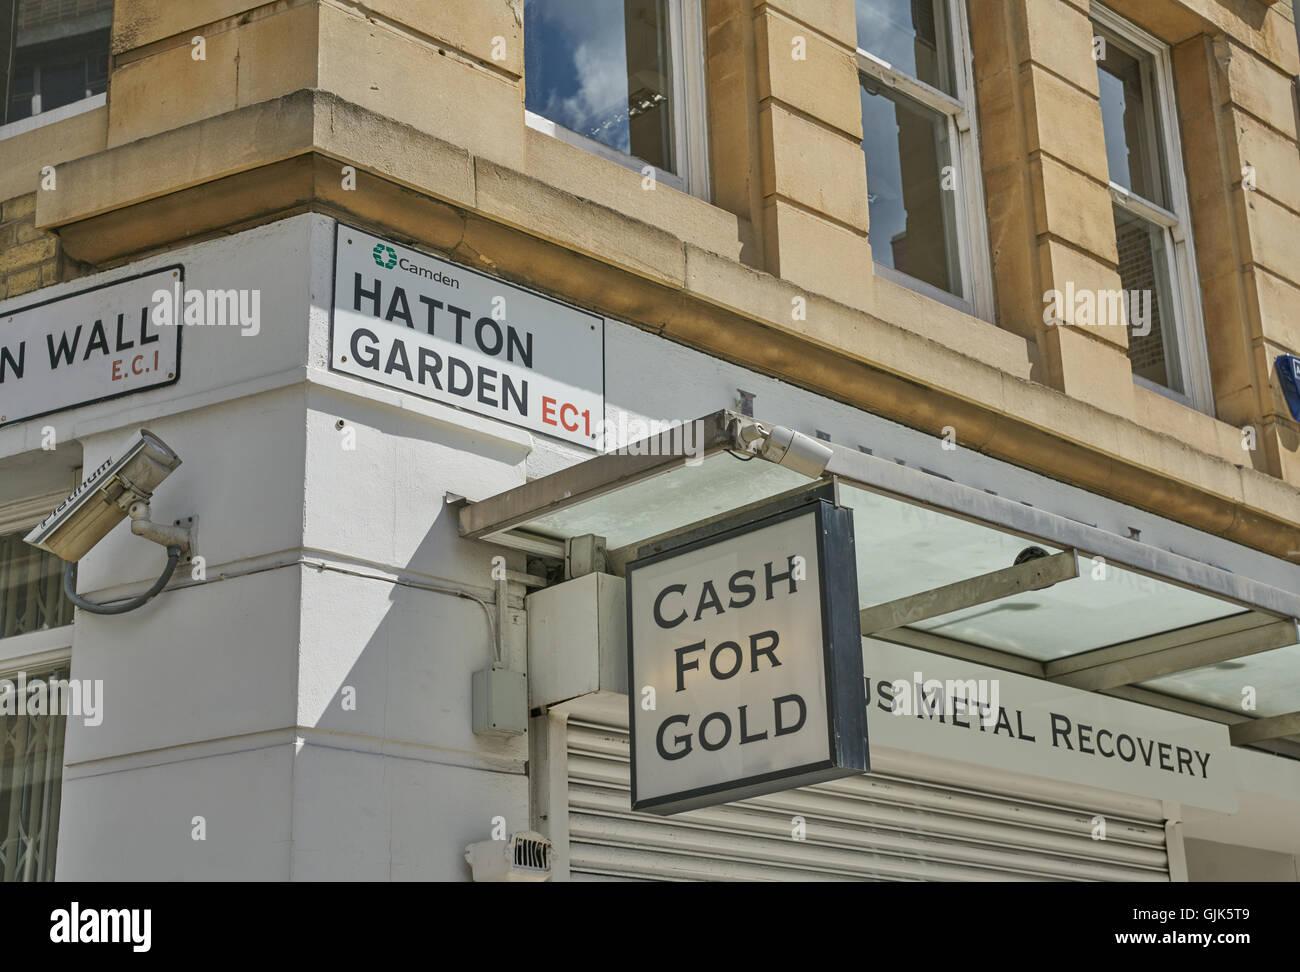 Hatton Garden in London, Metallrückgewinnung, gold-shop Stockbild